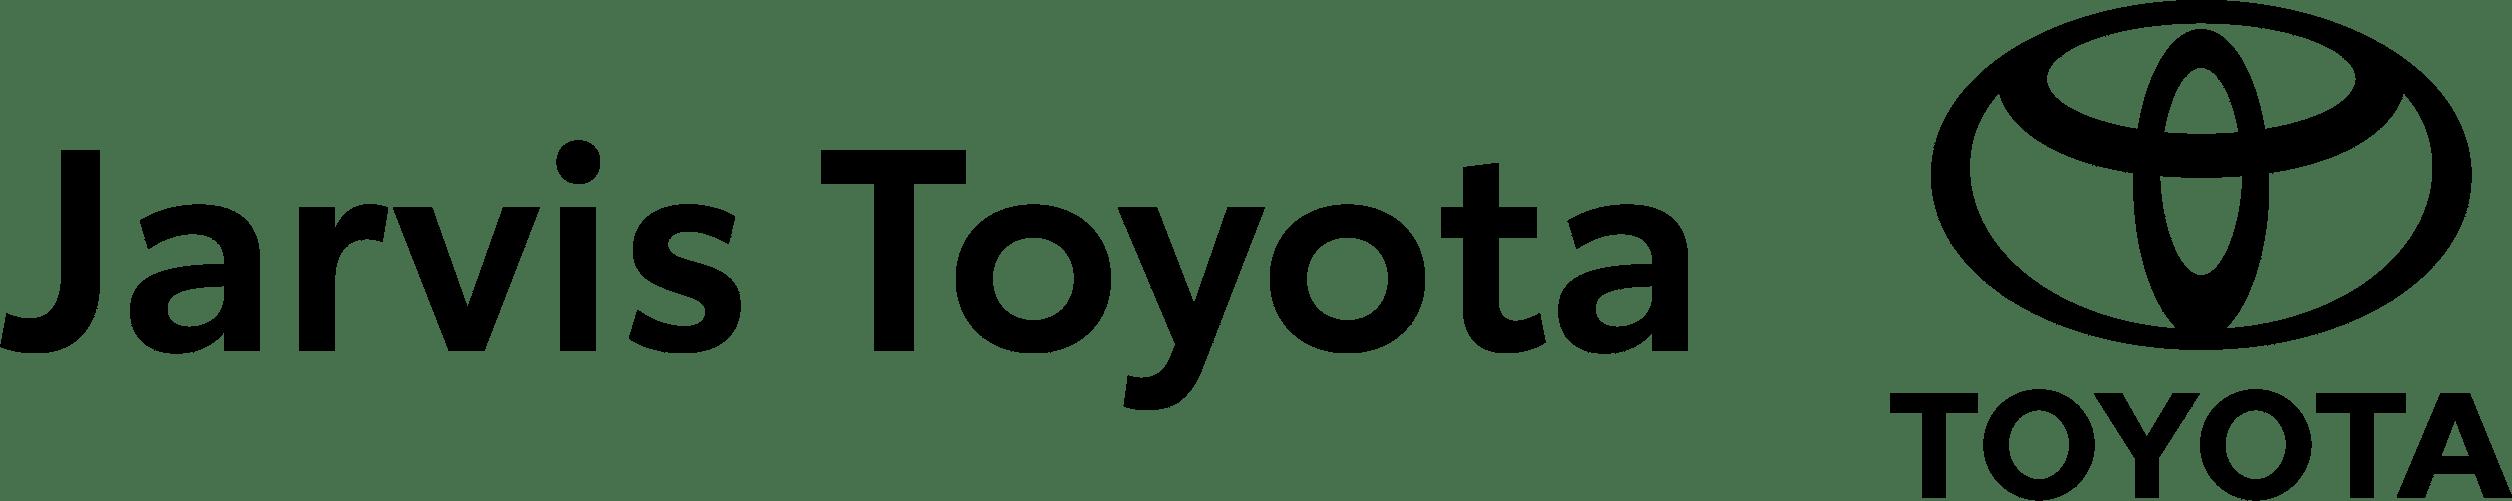 Jarvis Toyota - Black Logo